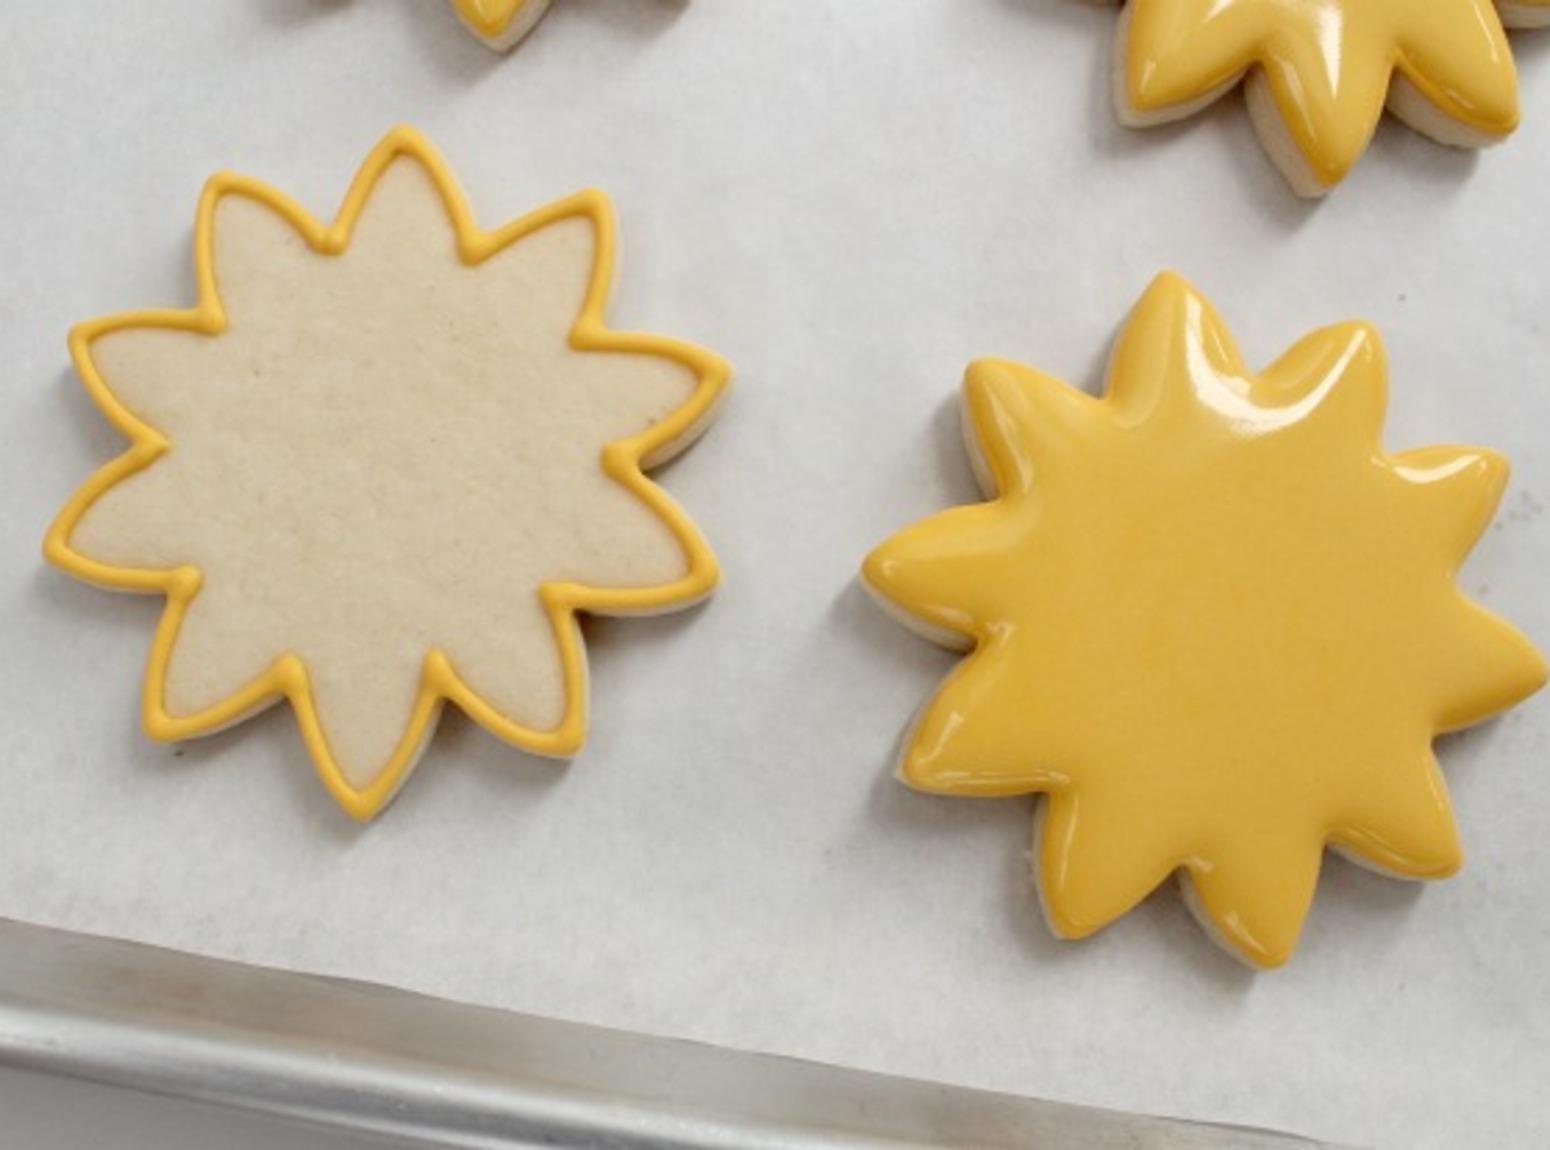 Sugarbelle's Perfect Sugar Cookies Recipe